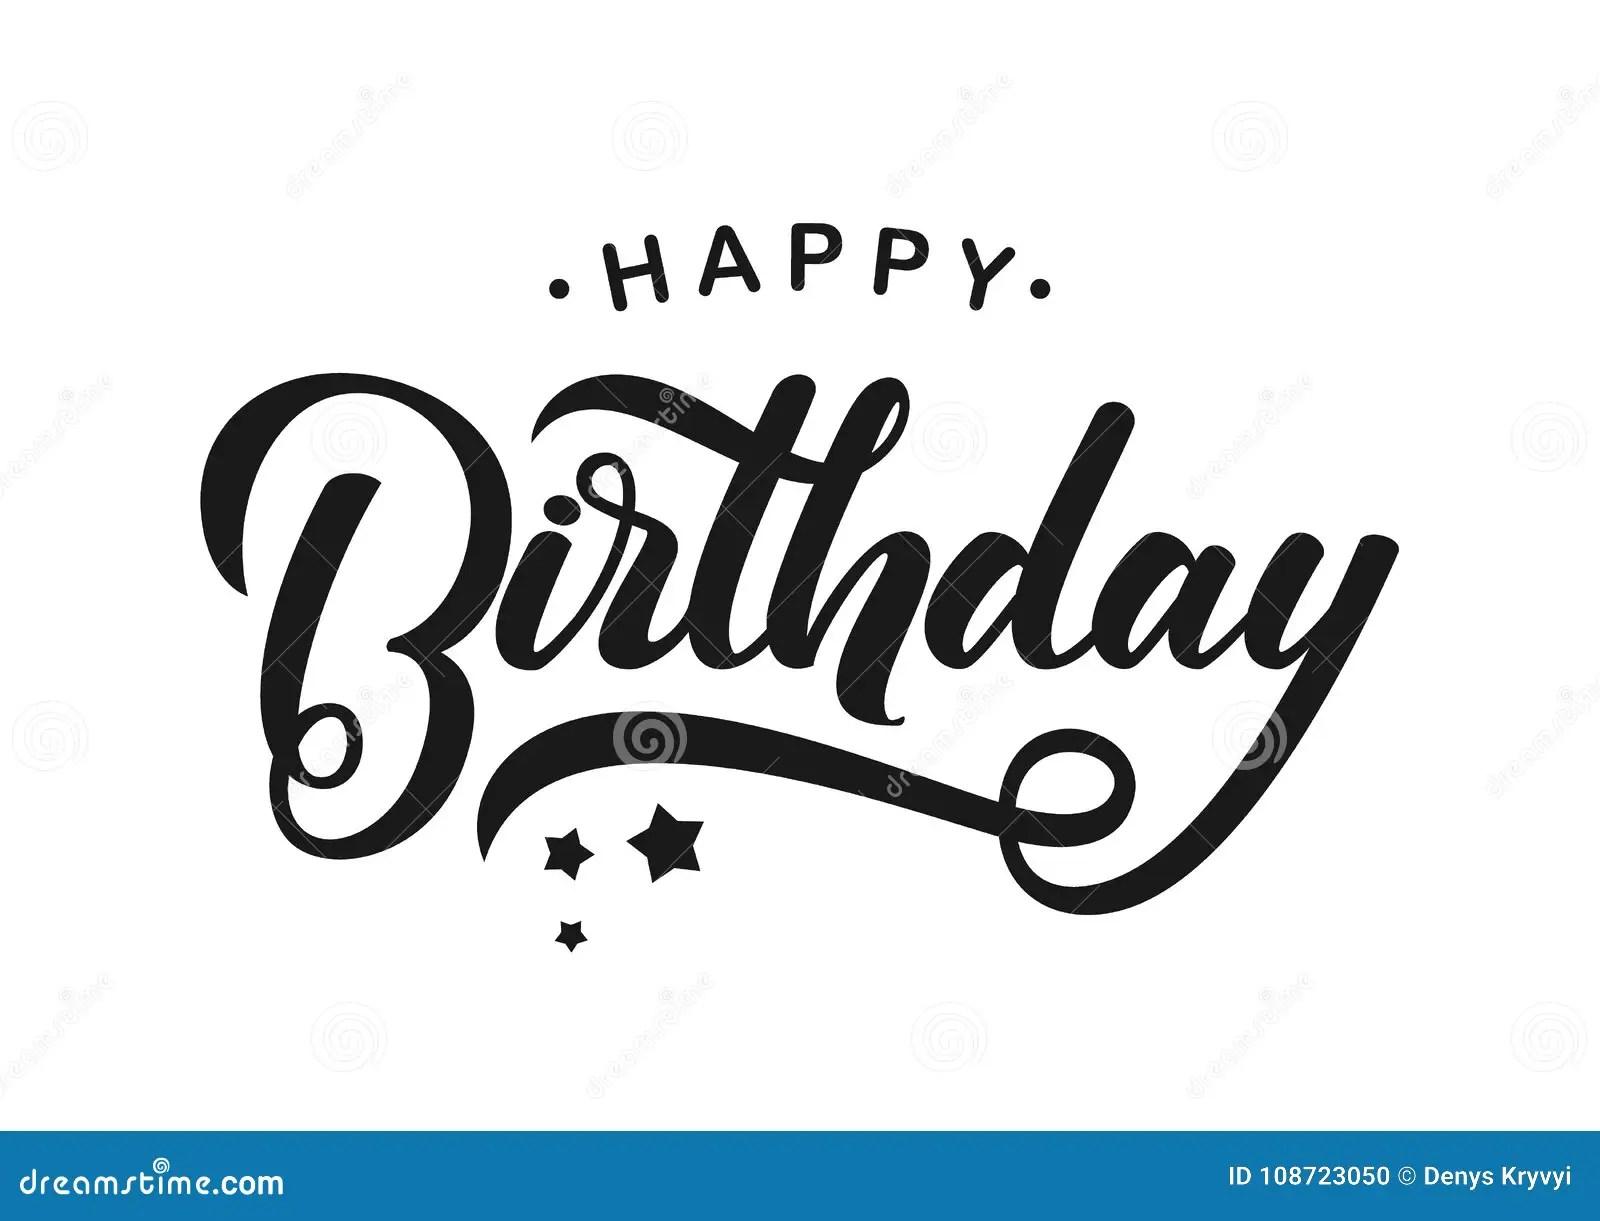 Handwritten Modern Brush Lettering Of Happy Birthday On